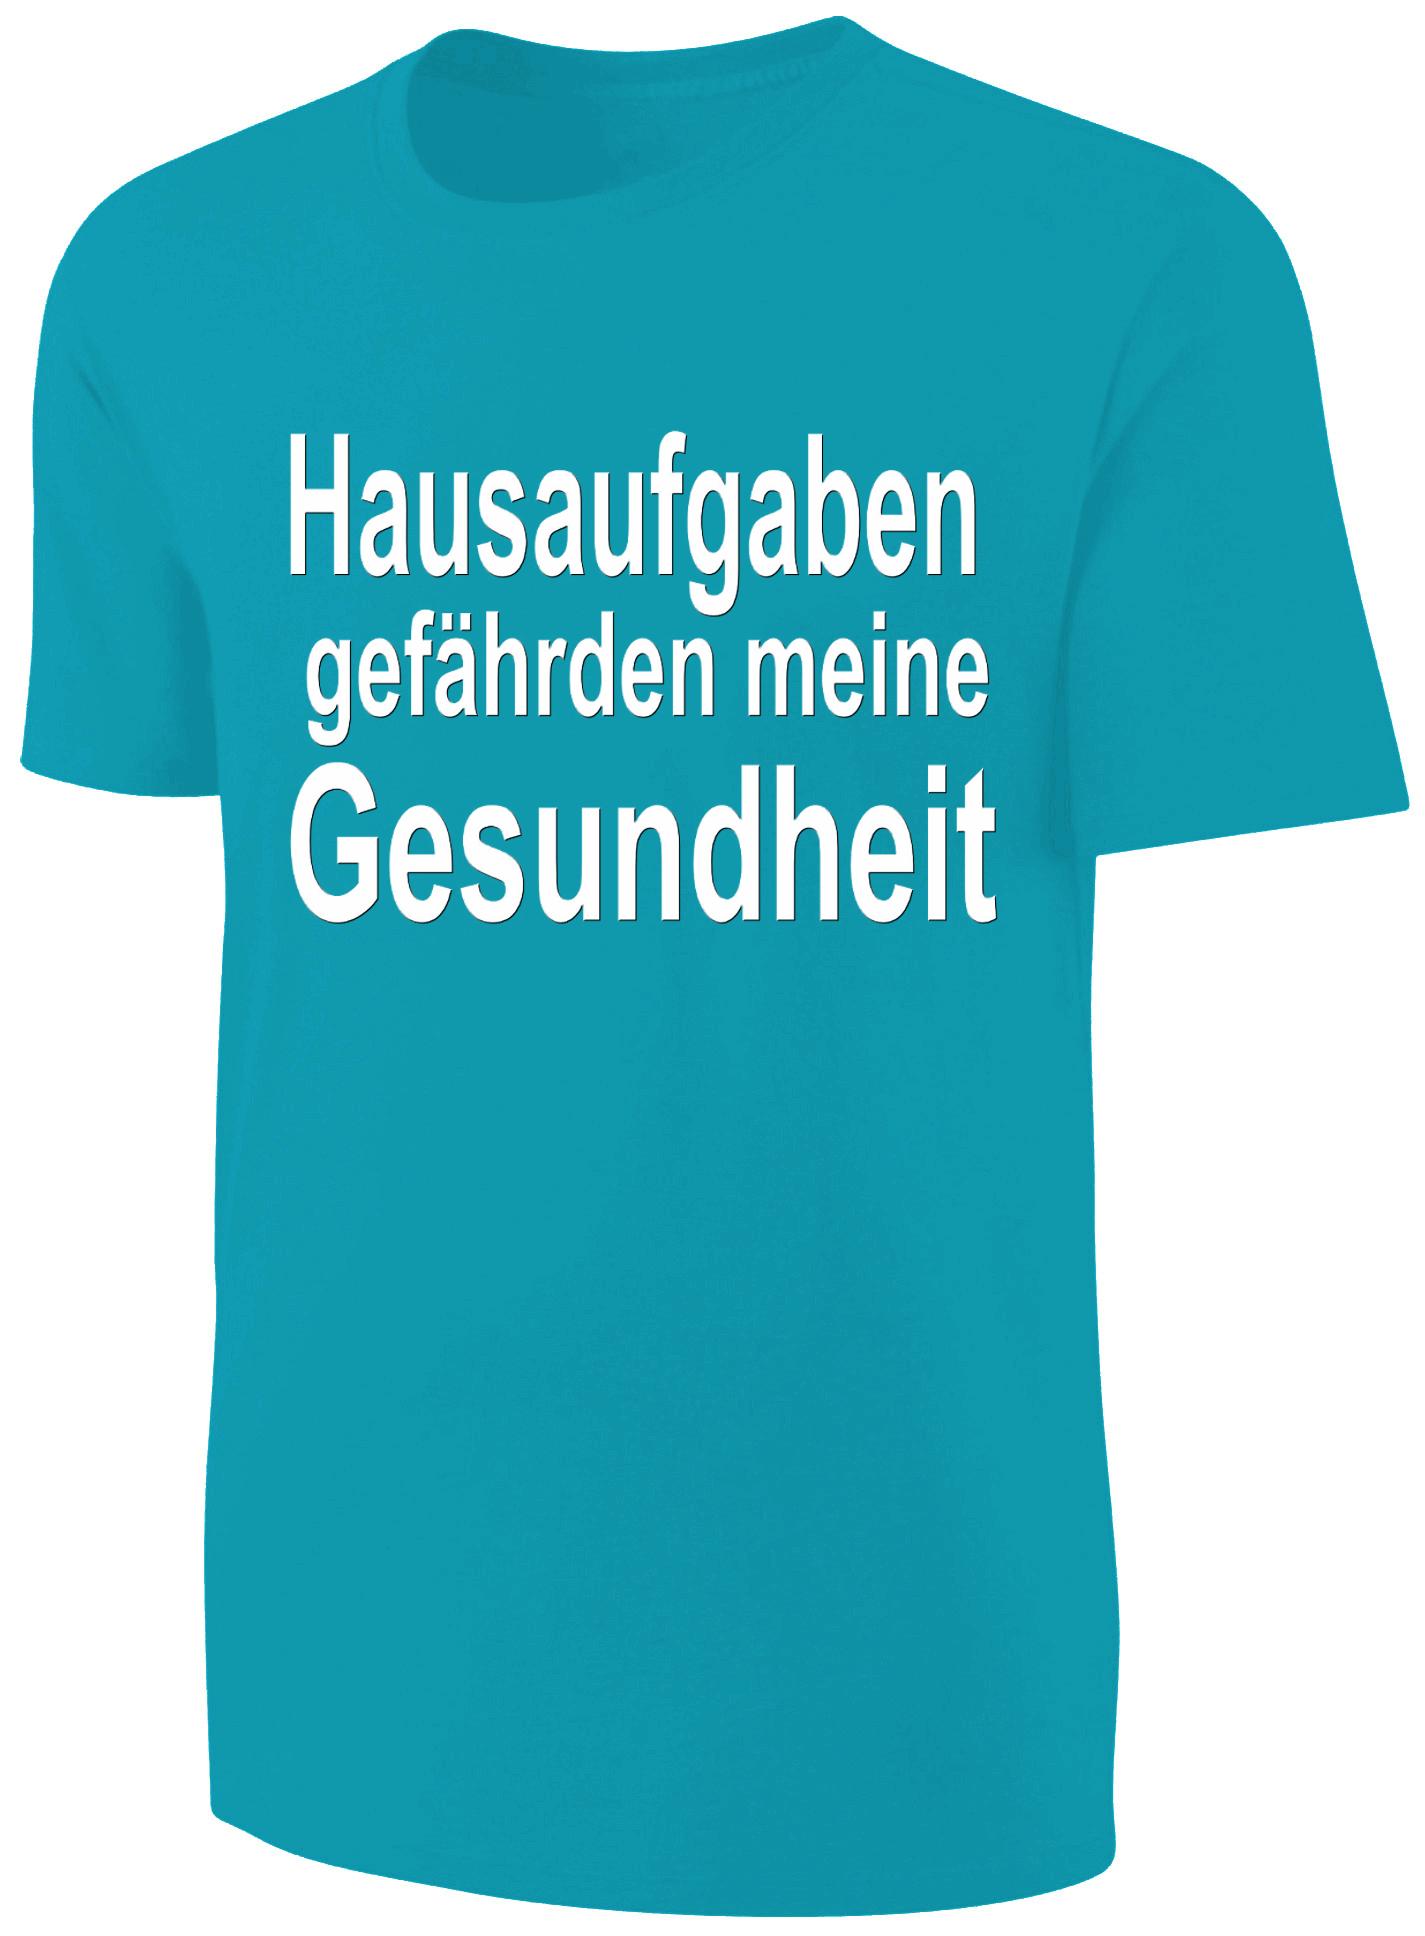 Full Size of Landwirt Sprüche T Shirt Sprüche T Shirt Kinder Sprüche T Shirt Jga Frauen Apres Ski Sprüche T Shirt Küche Sprüche T Shirt